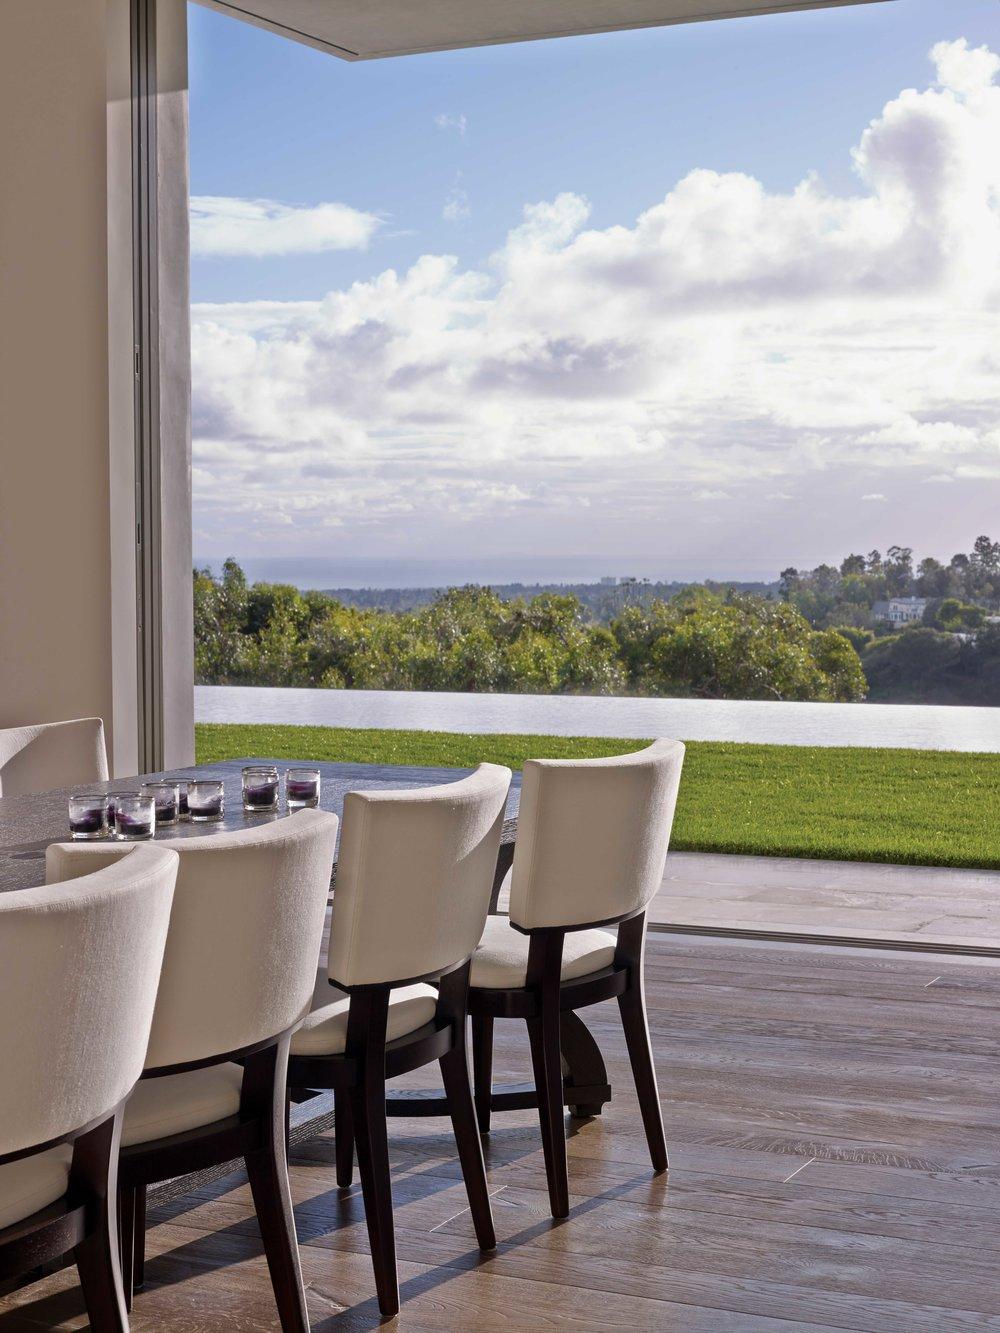 A_Stradella_JulieToy_Dining-Room-Table-Open-Doorway_7164-e.jpg